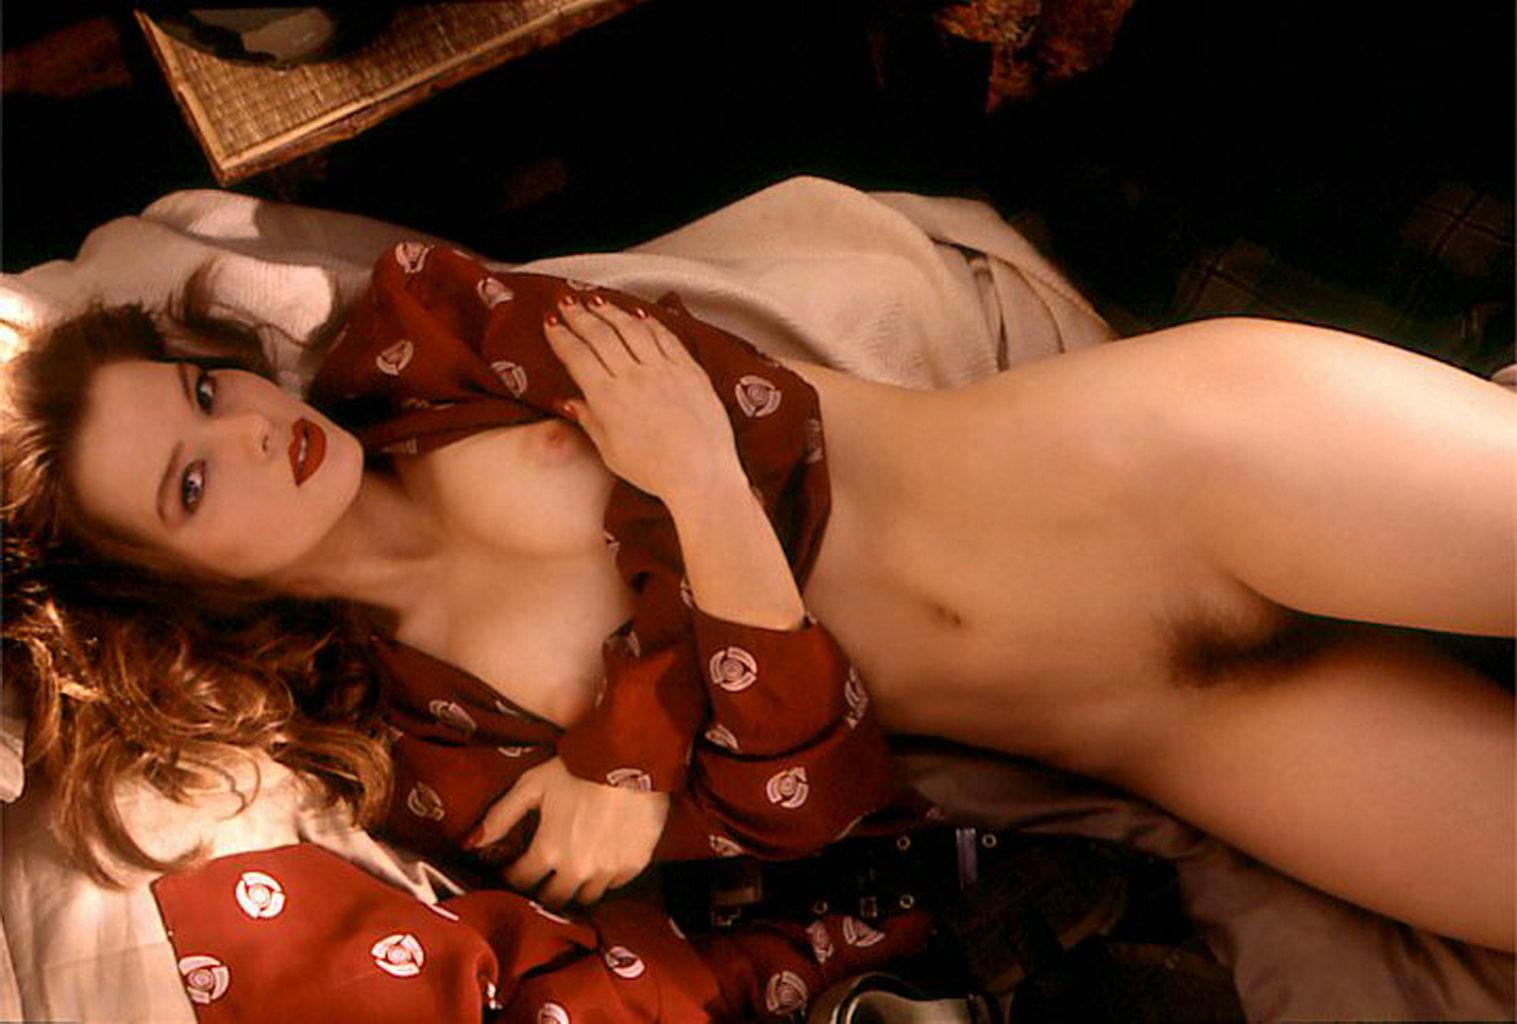 amanda hope nude